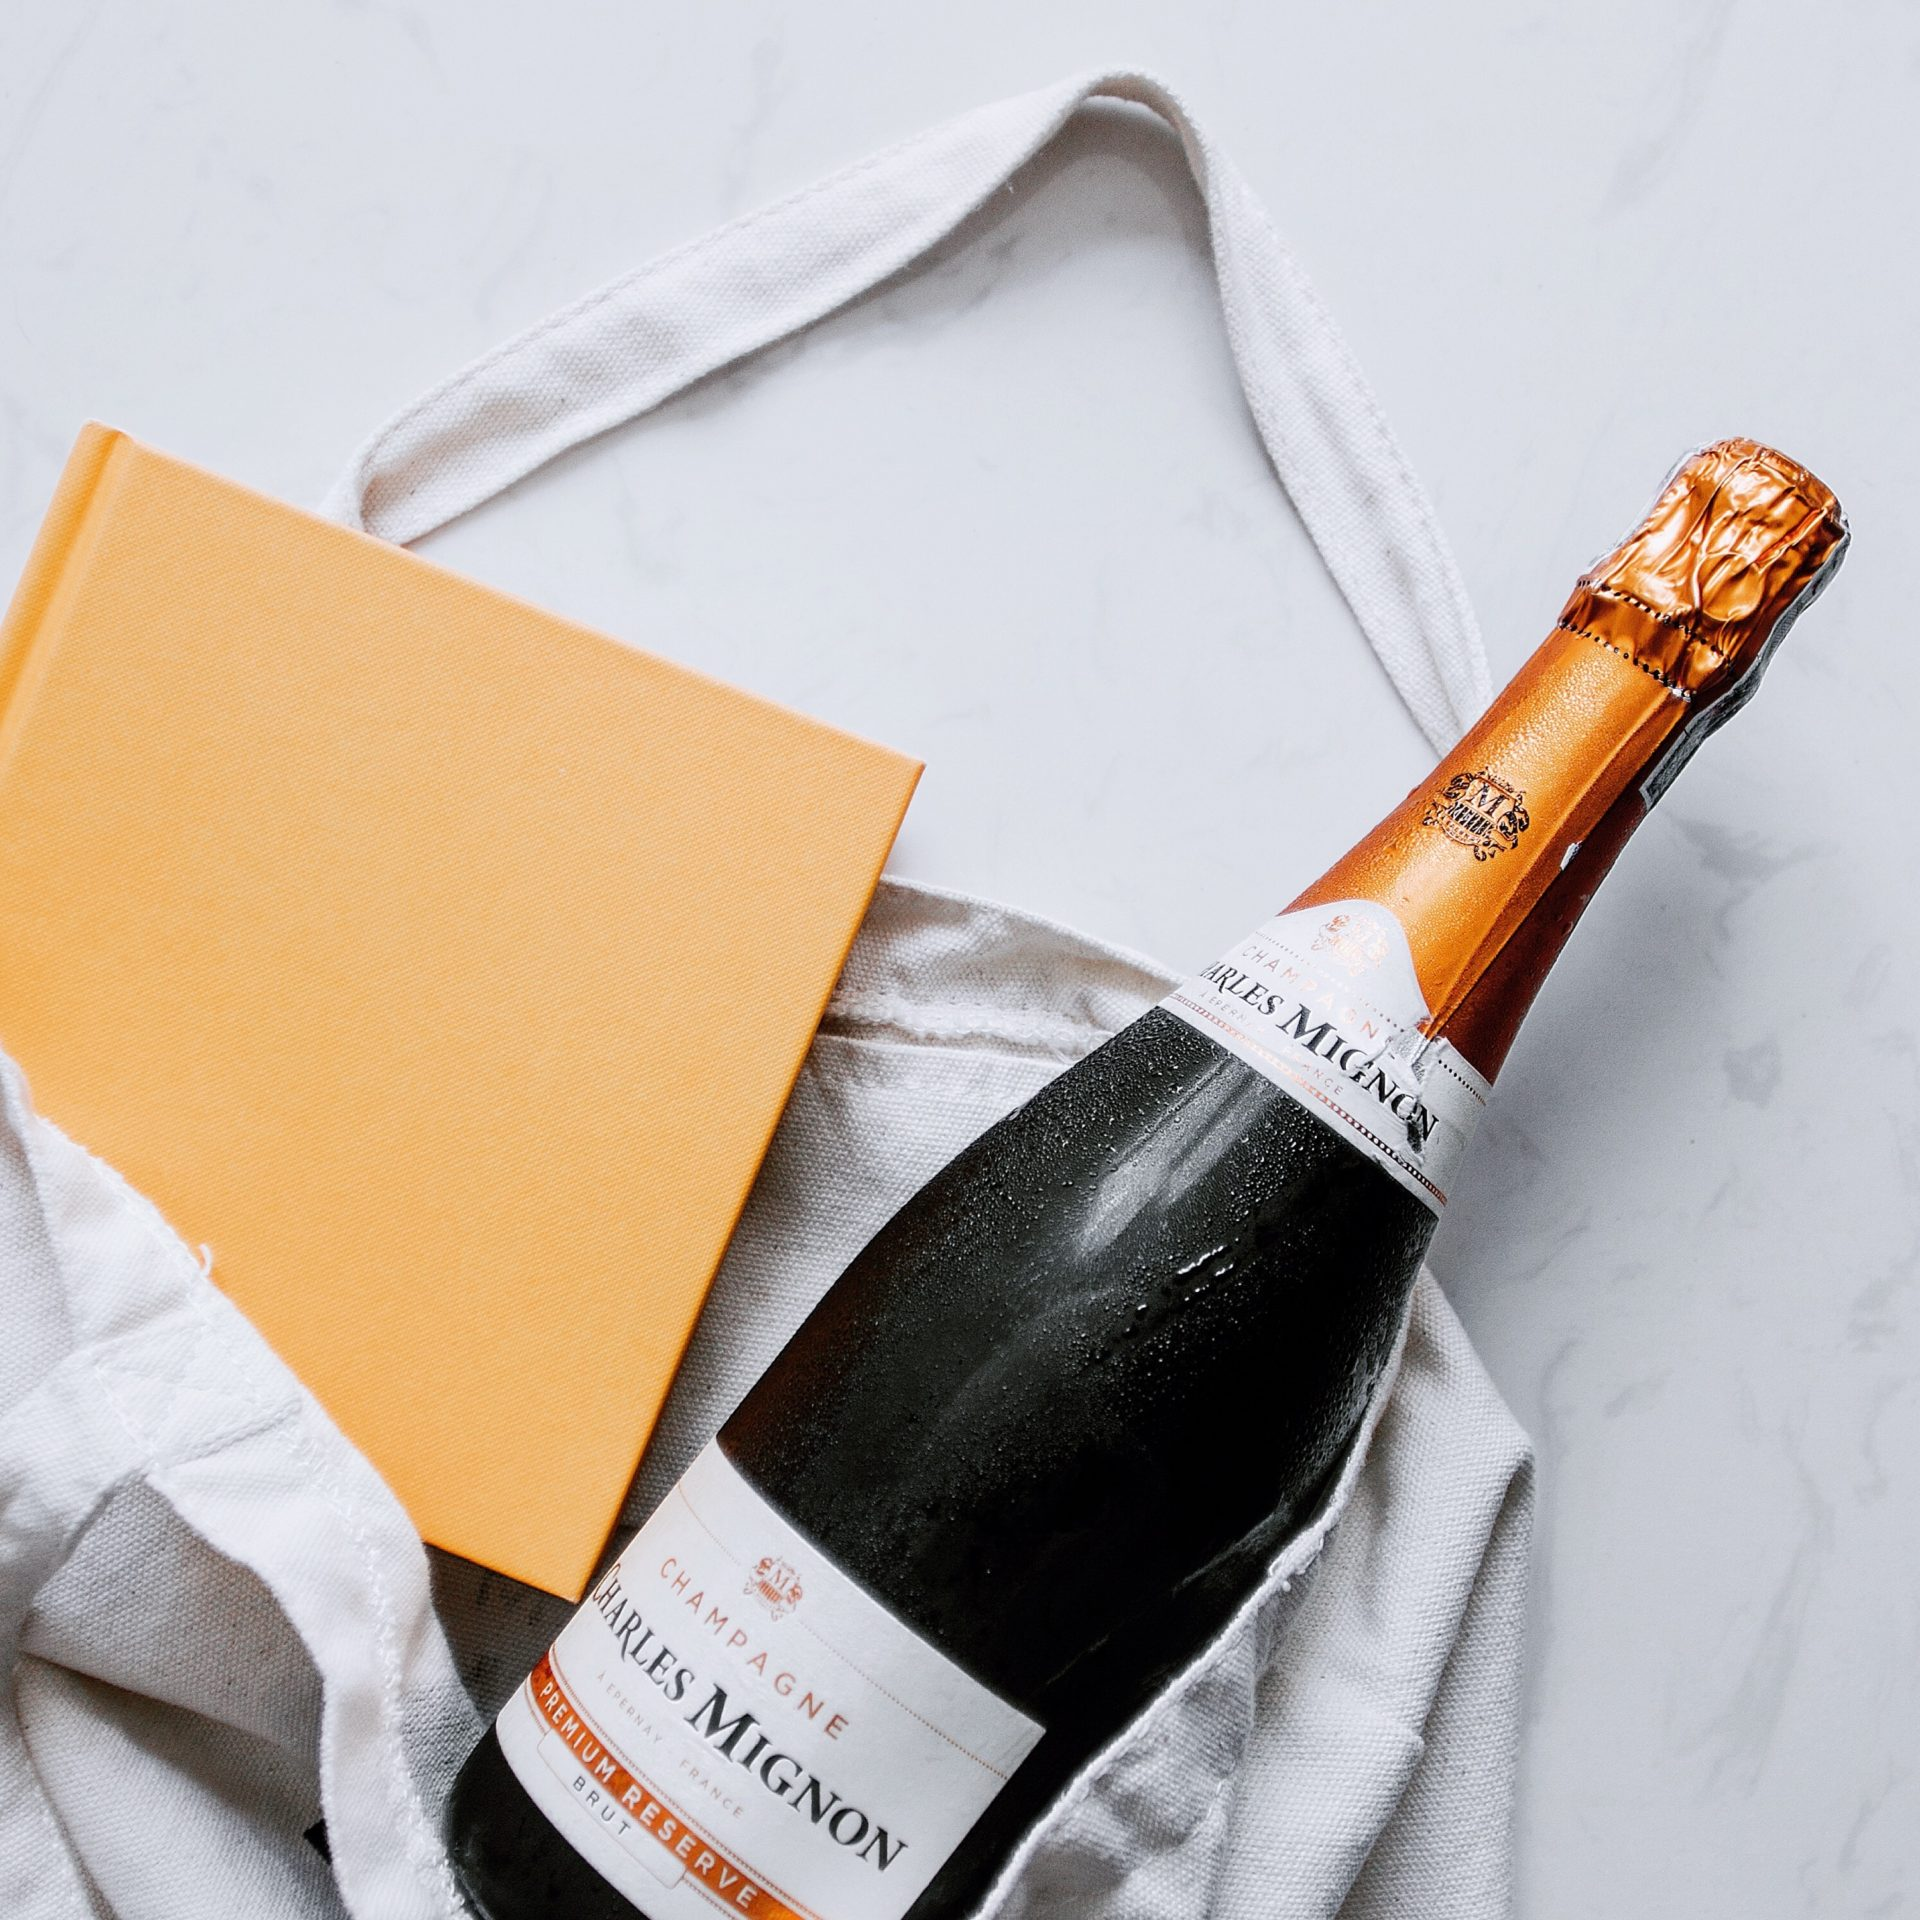 Accueil Champagne